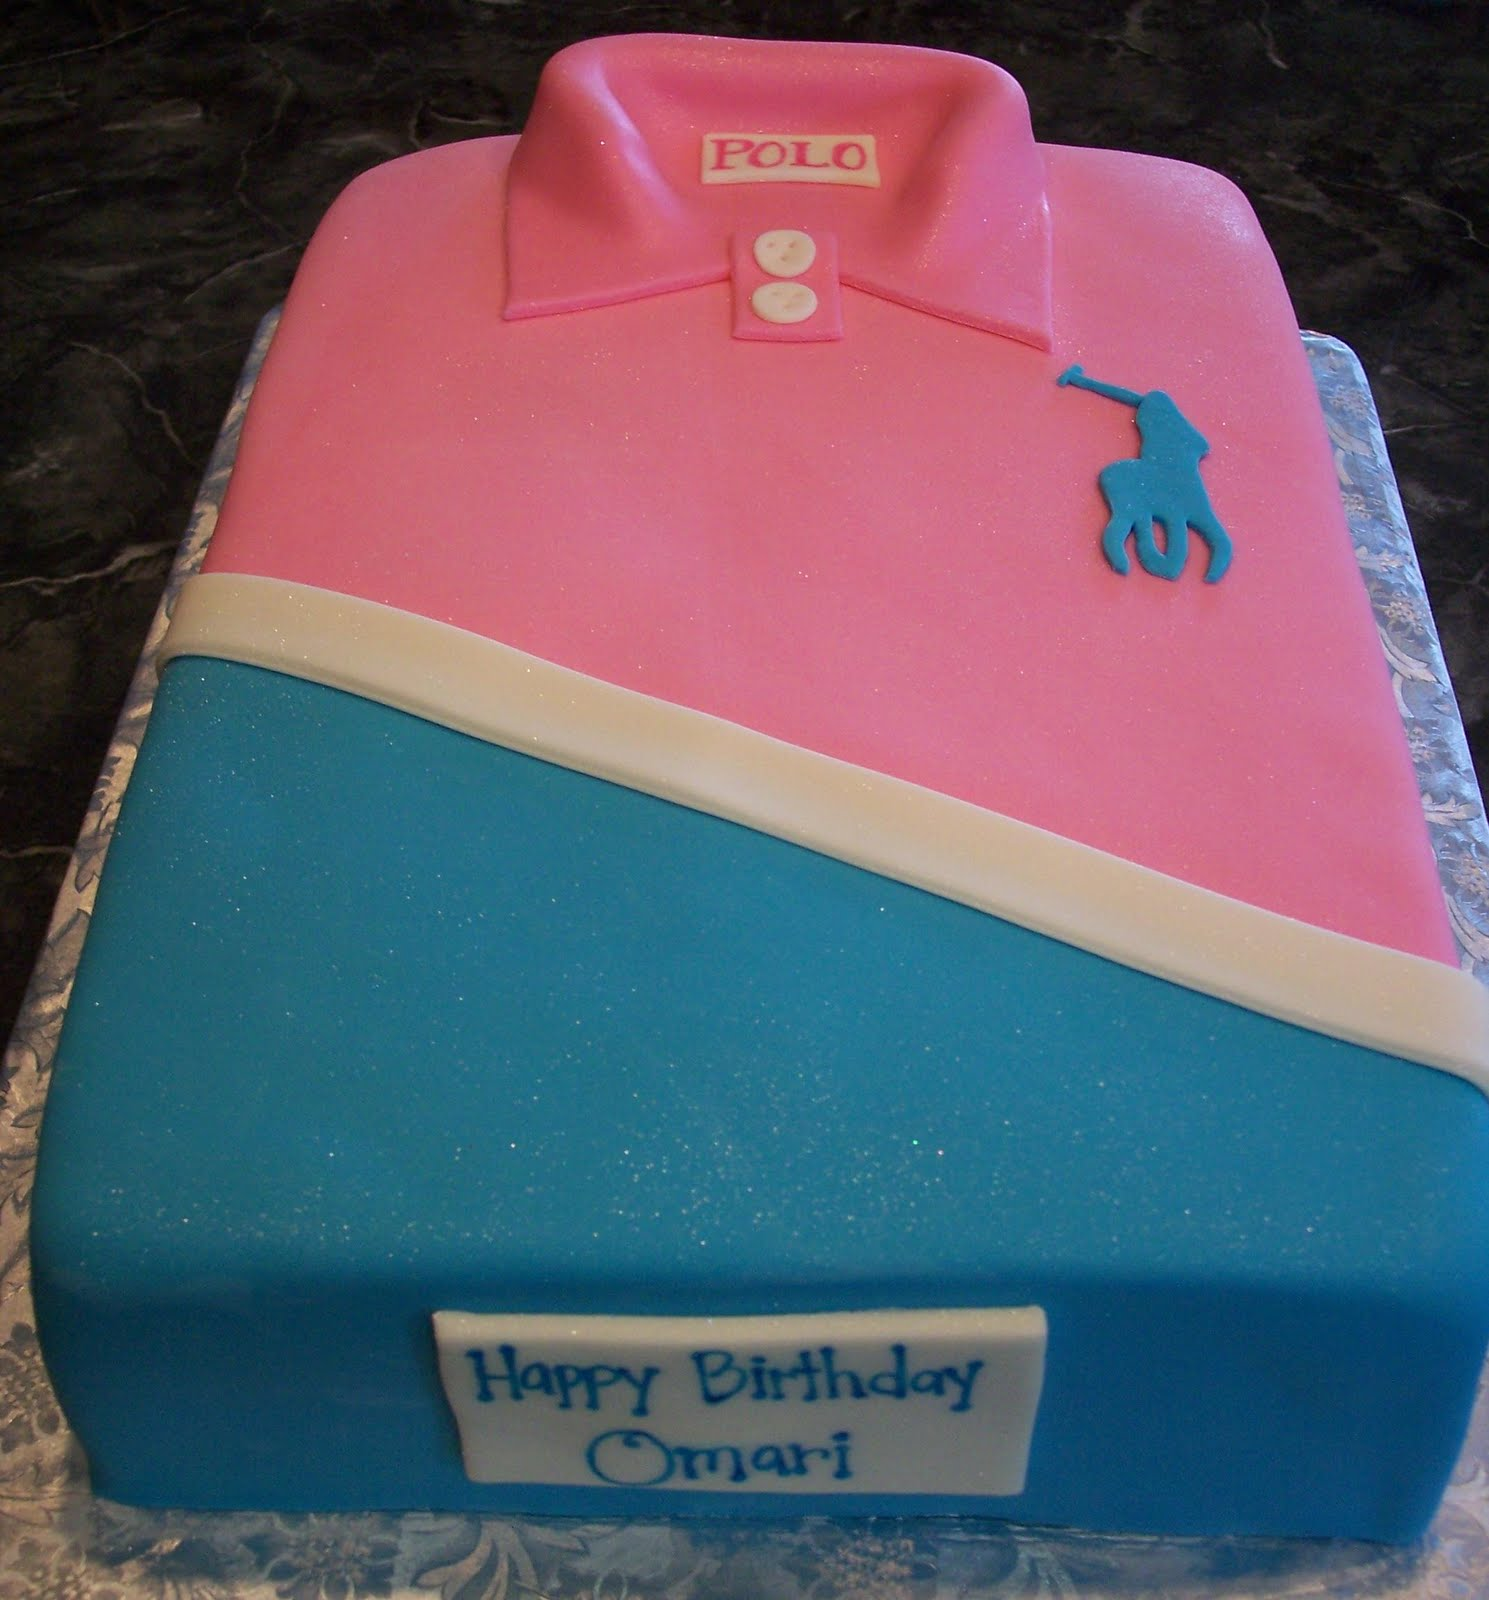 Cake Polo Shirt Design : MyMoniCakes: Pink & Blue Polo Shirt Cake